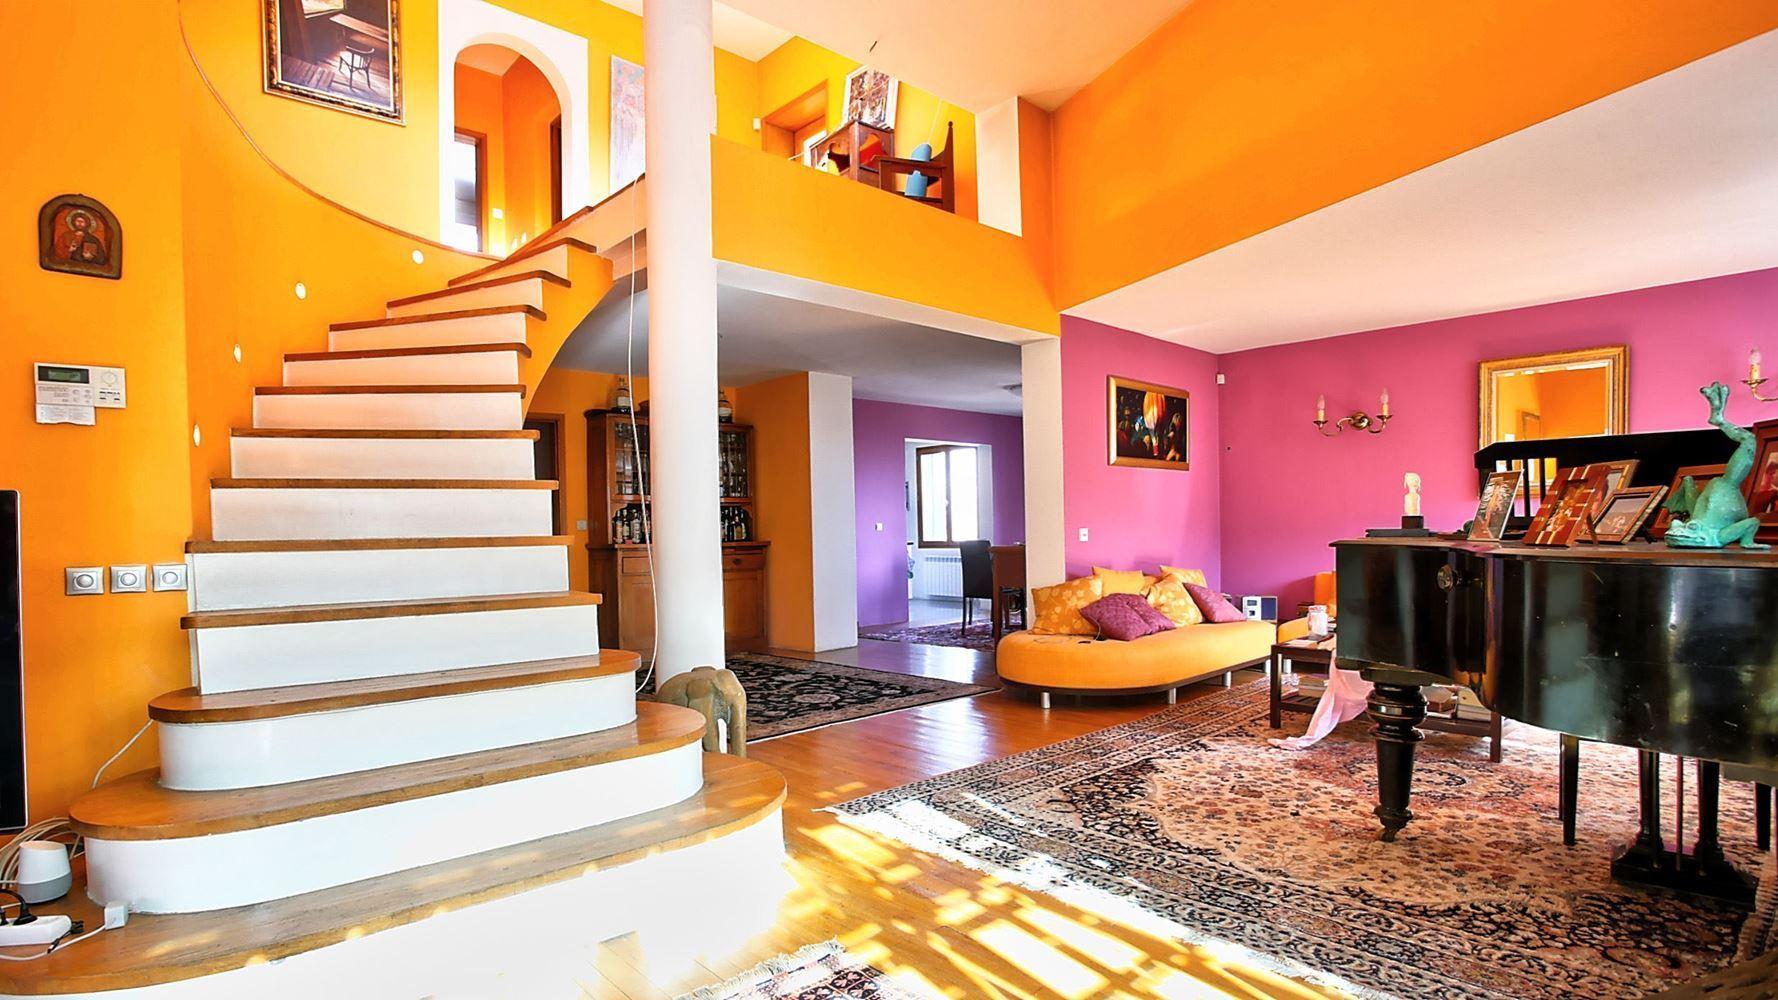 3-bedroom Apartment for Rent, Boyana